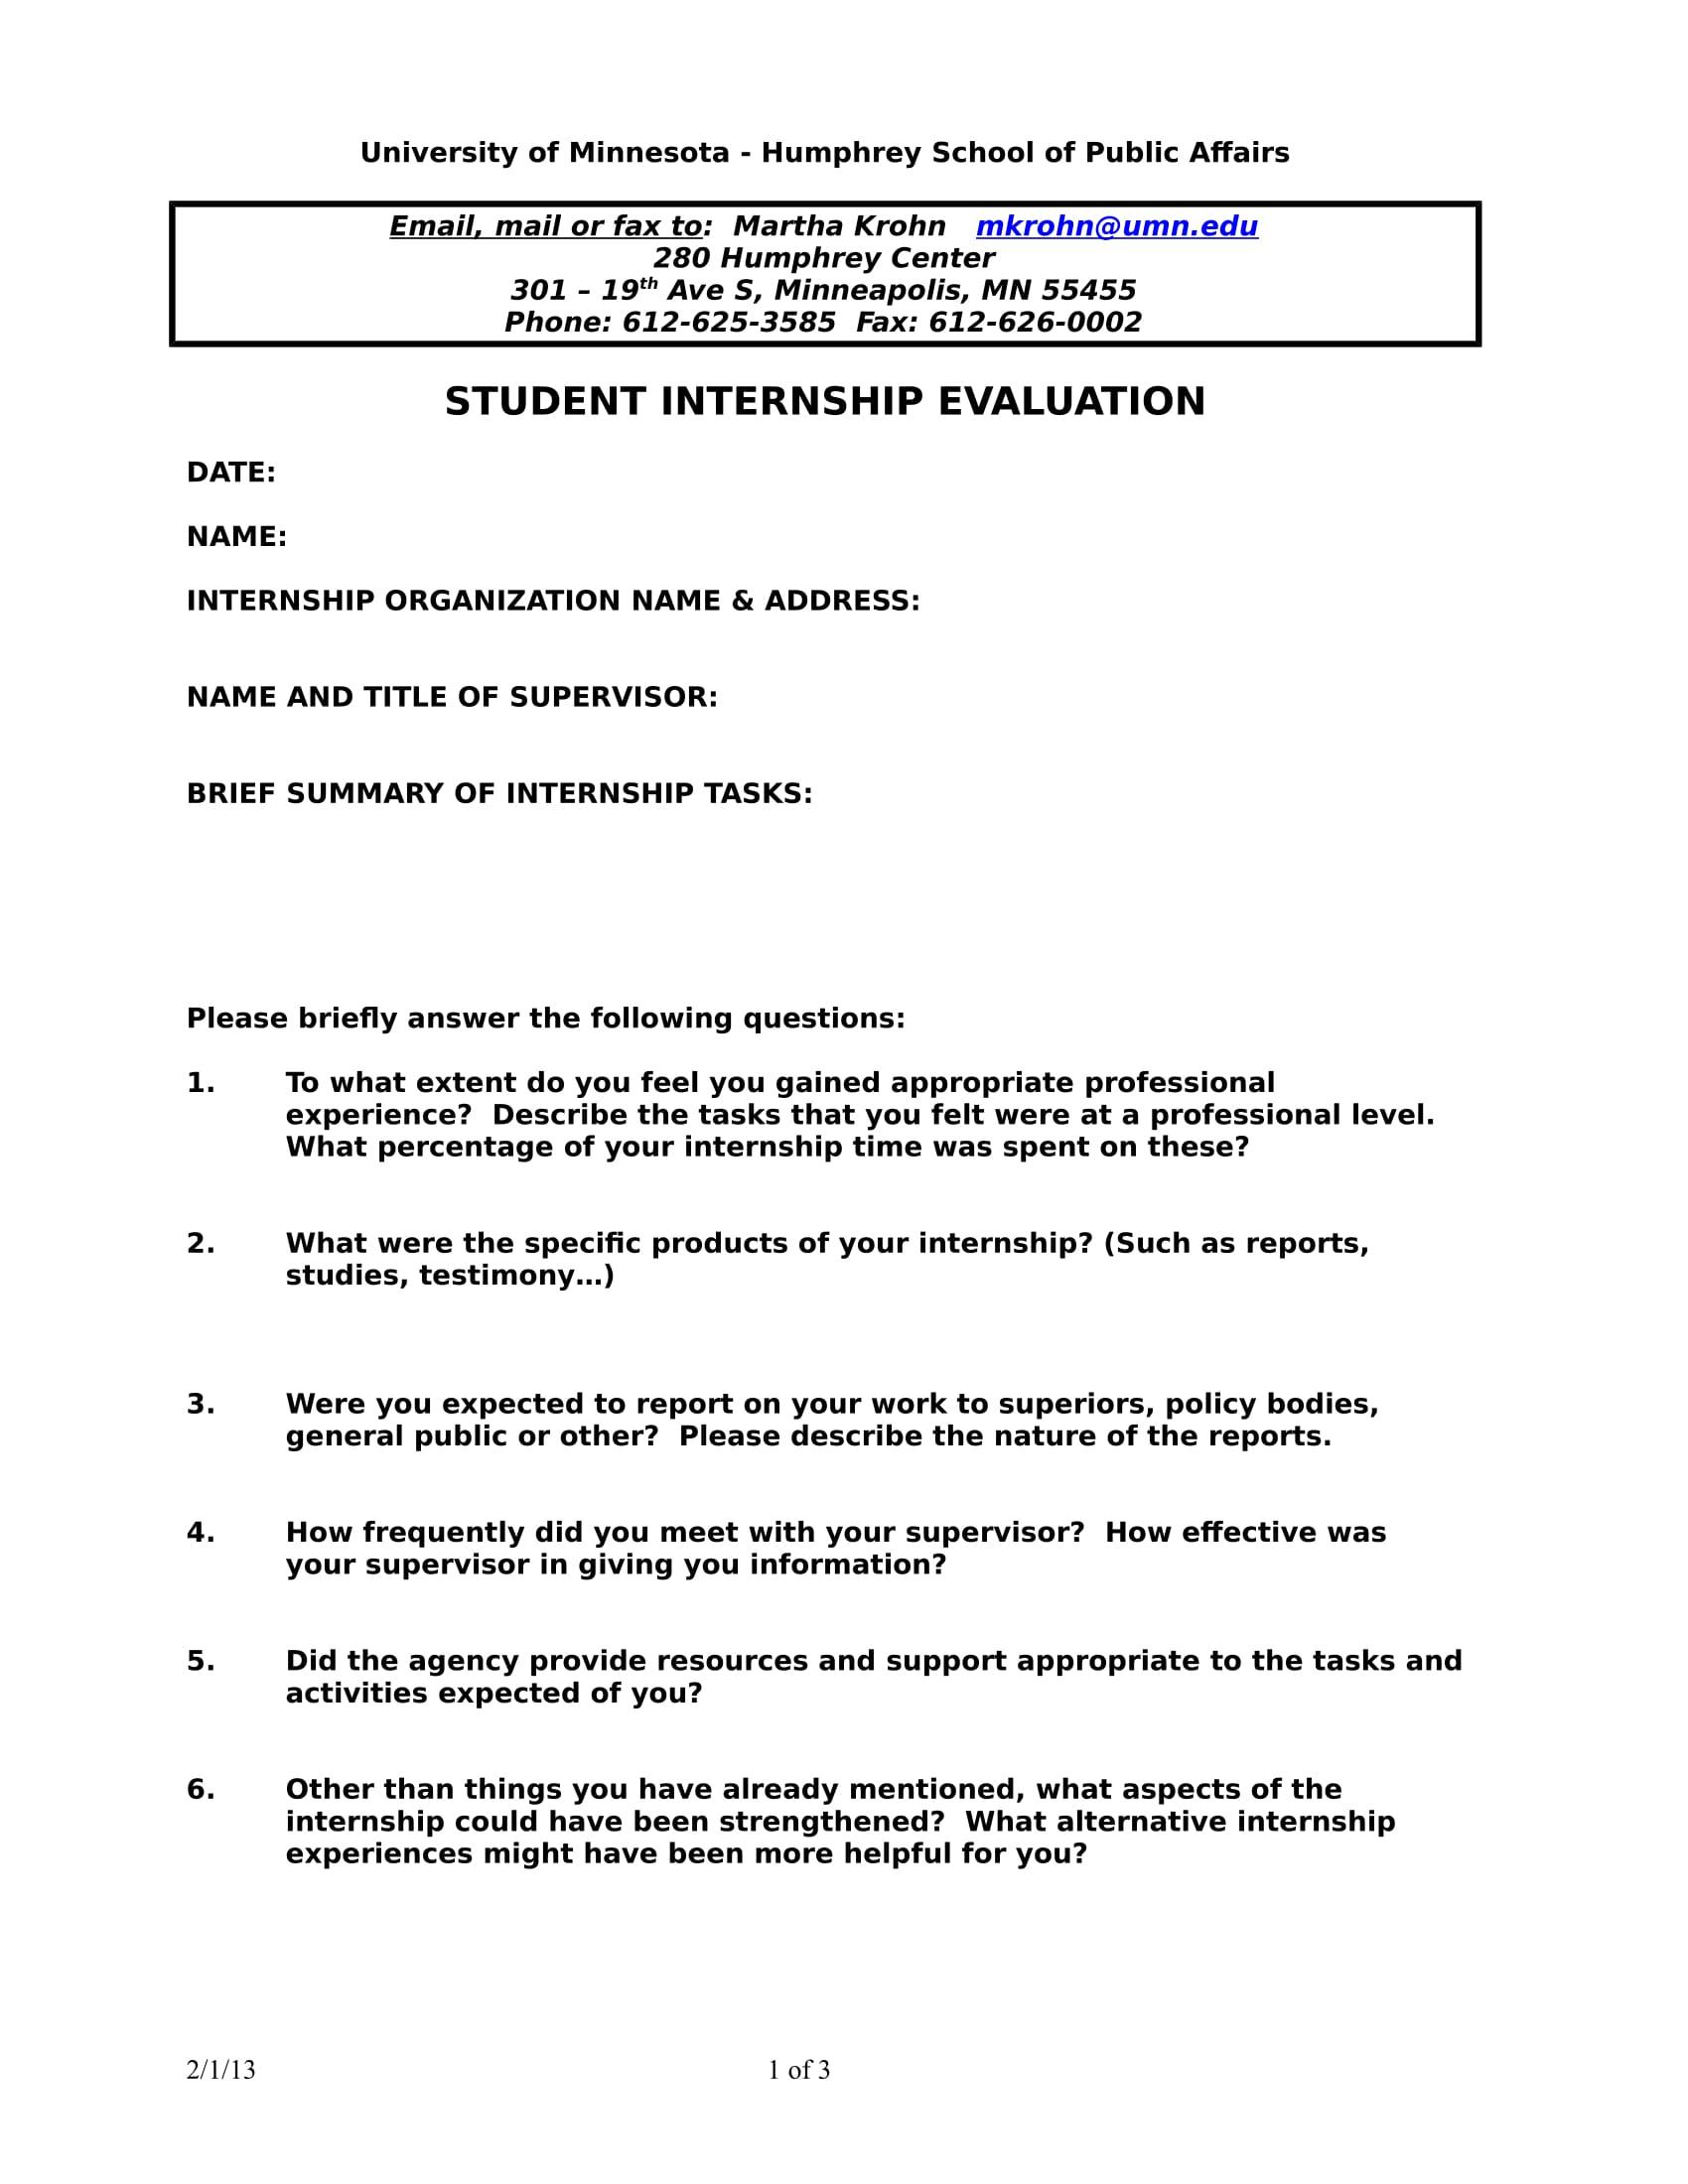 student internship evaluation form 1